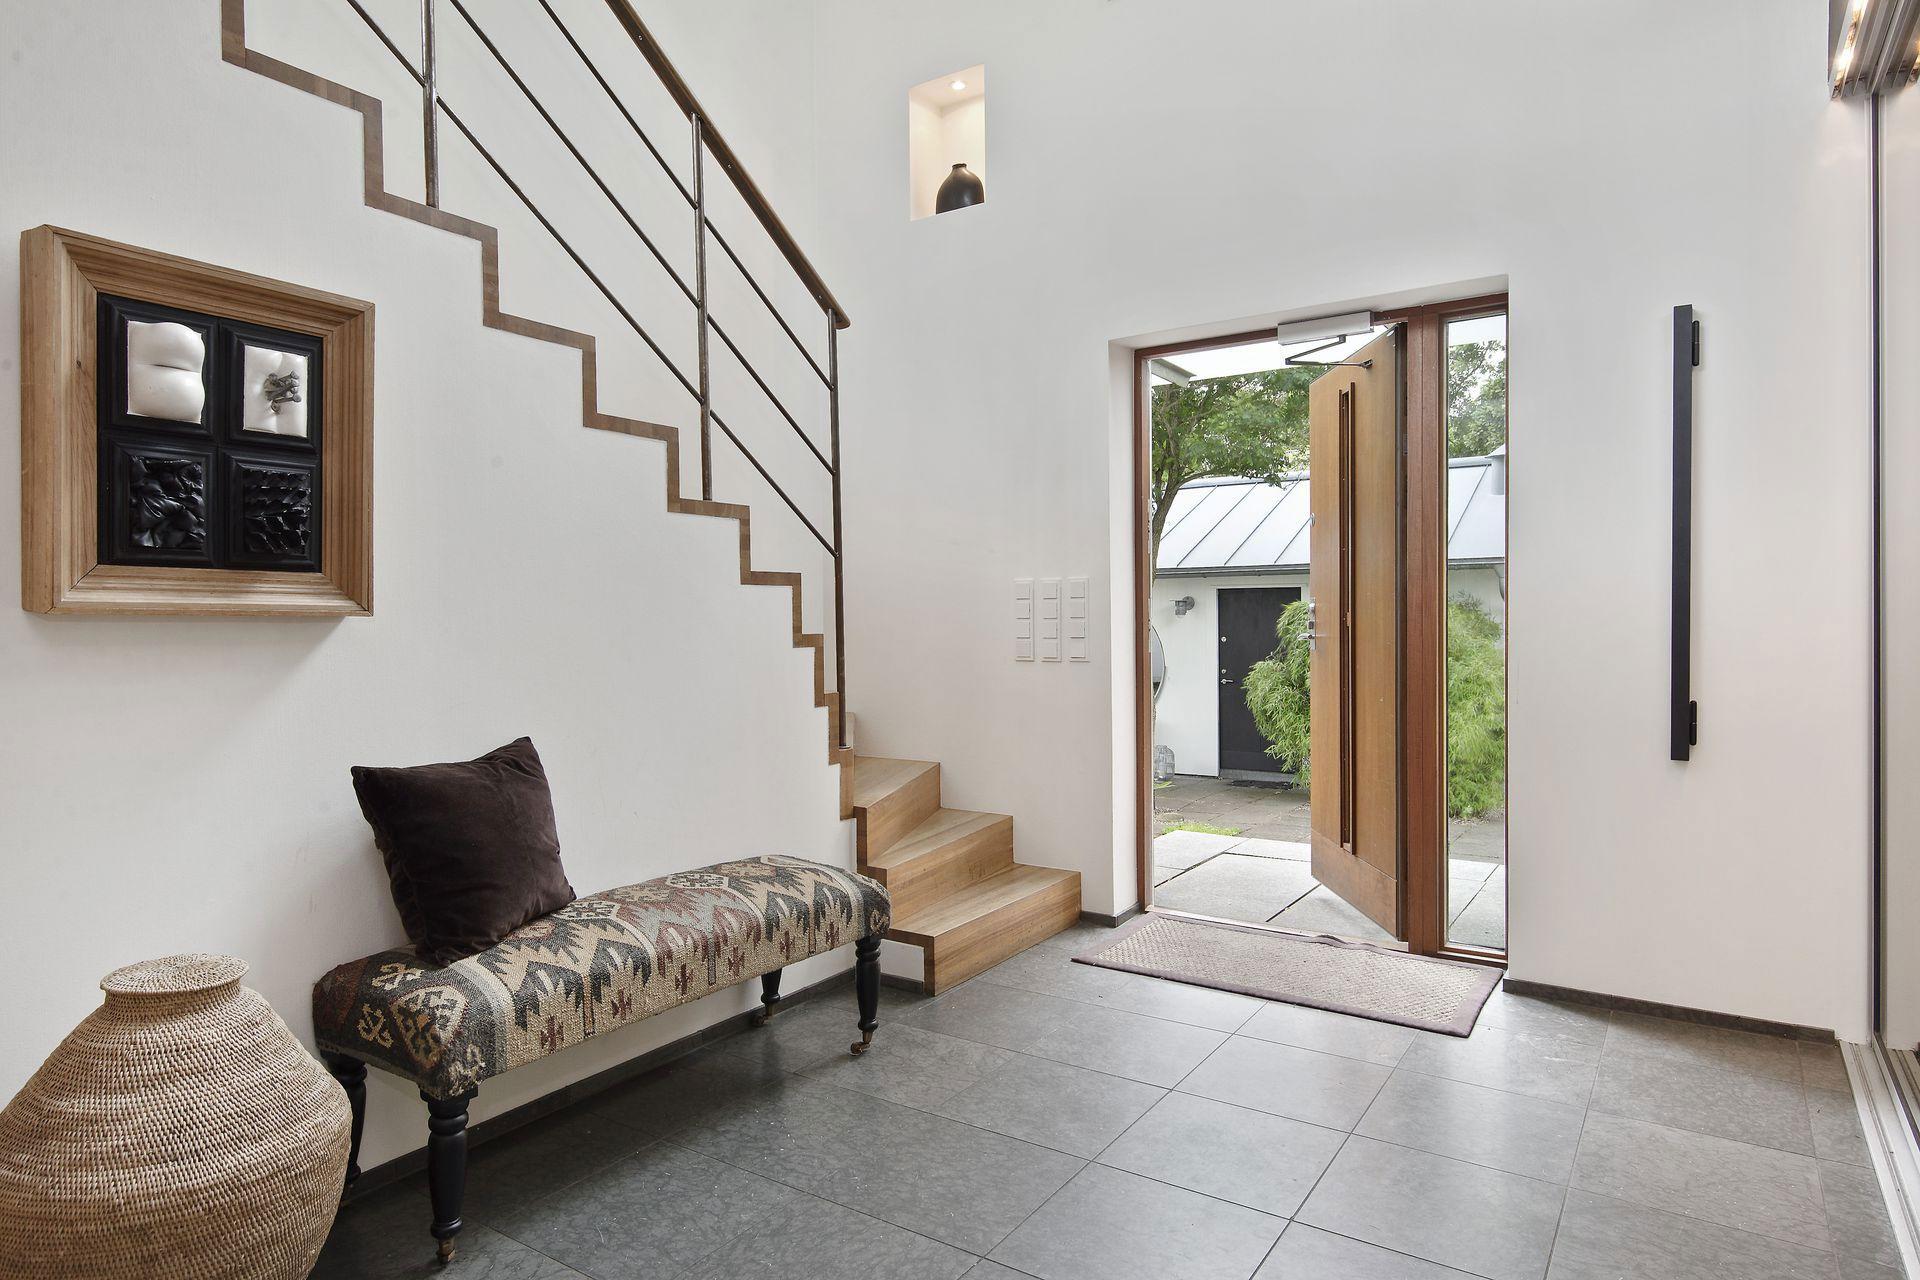 Stylish Home in Särö Sweden-14